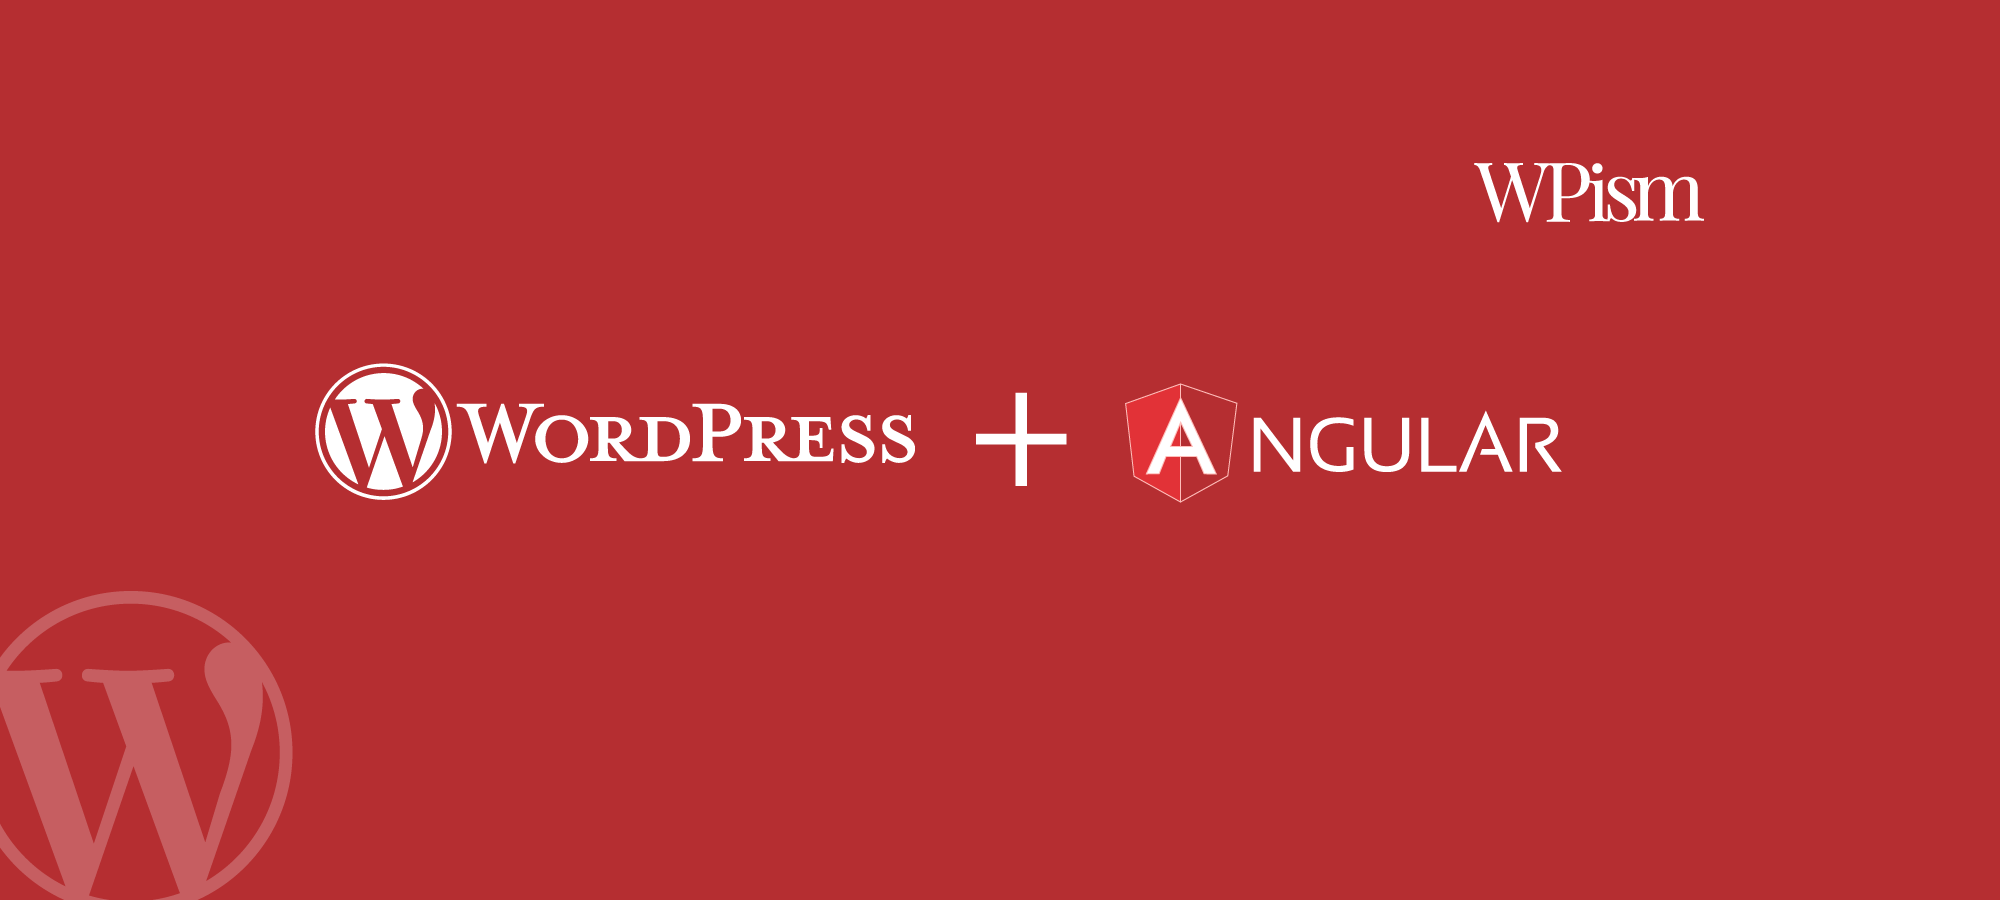 How to Use AngularJS with WordPress